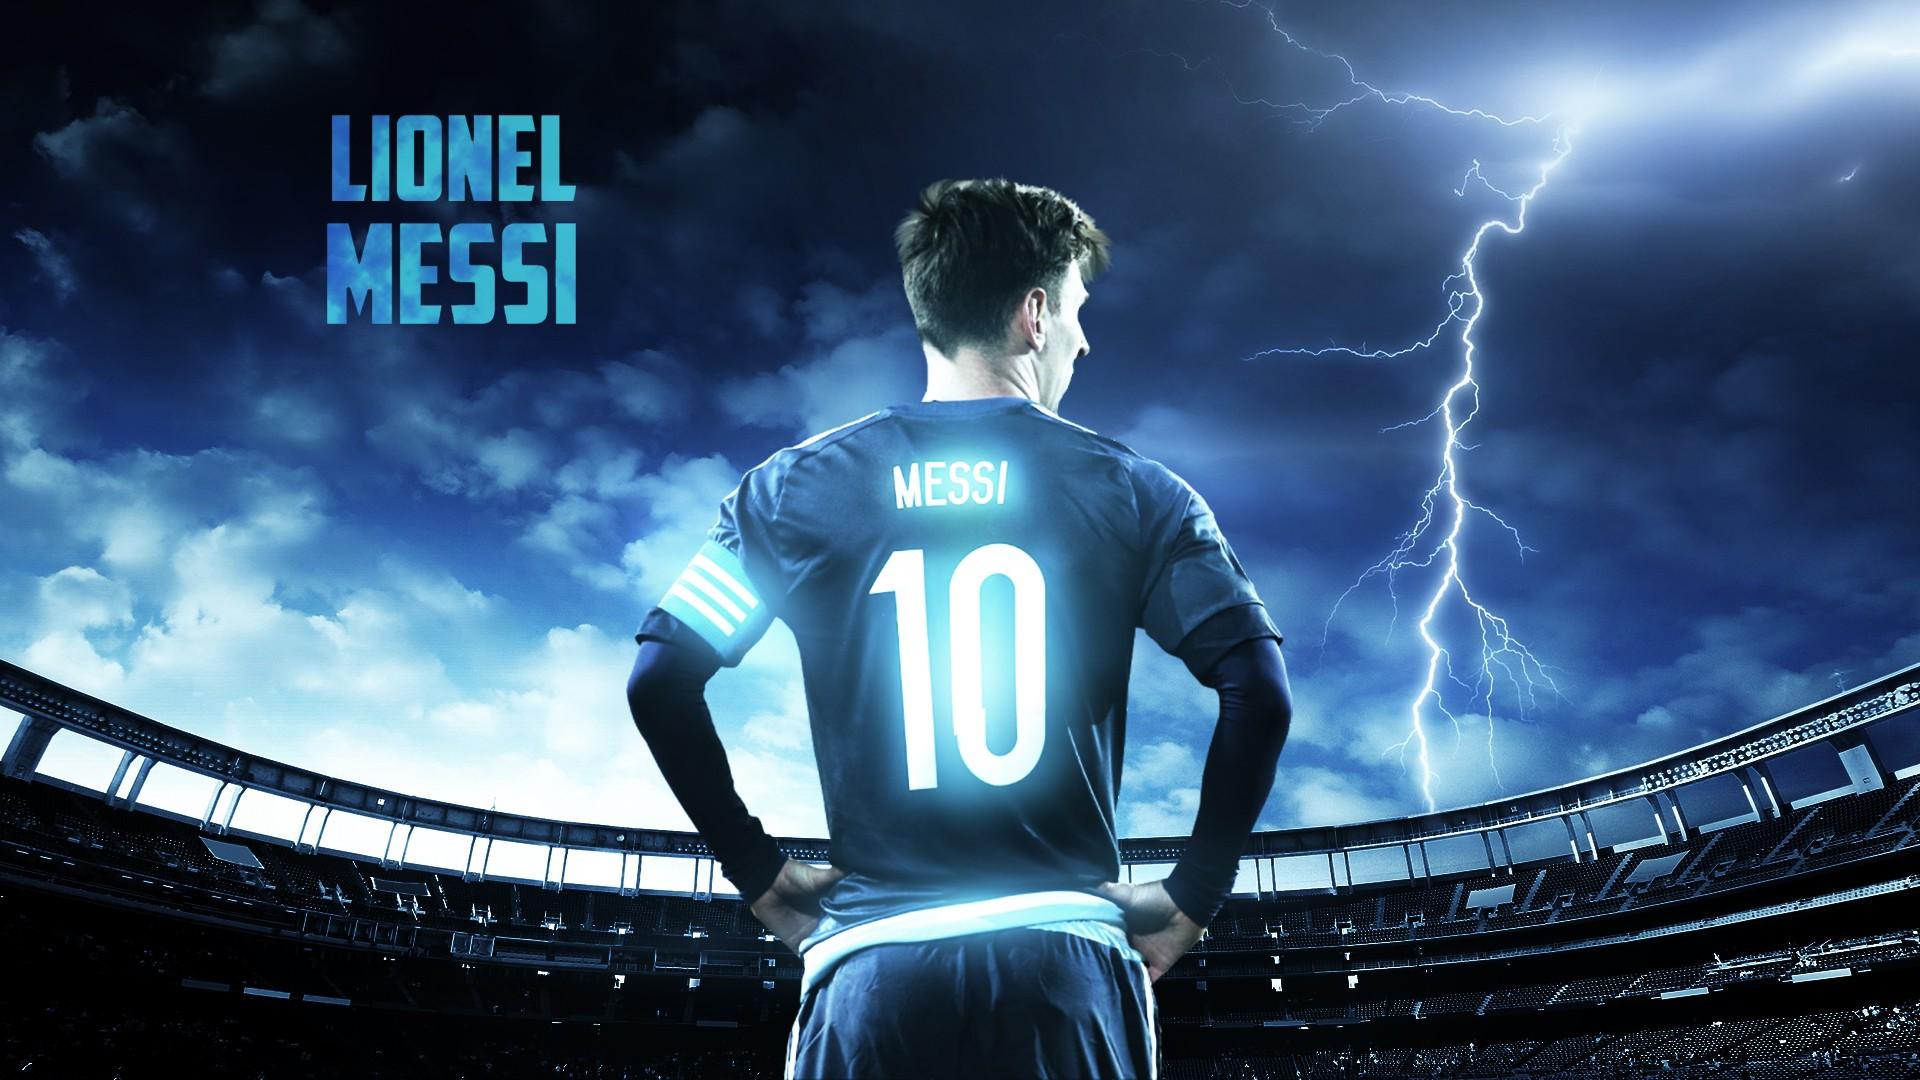 Fondos De Pantalla Trueno Estadio Leo Messi Lionel